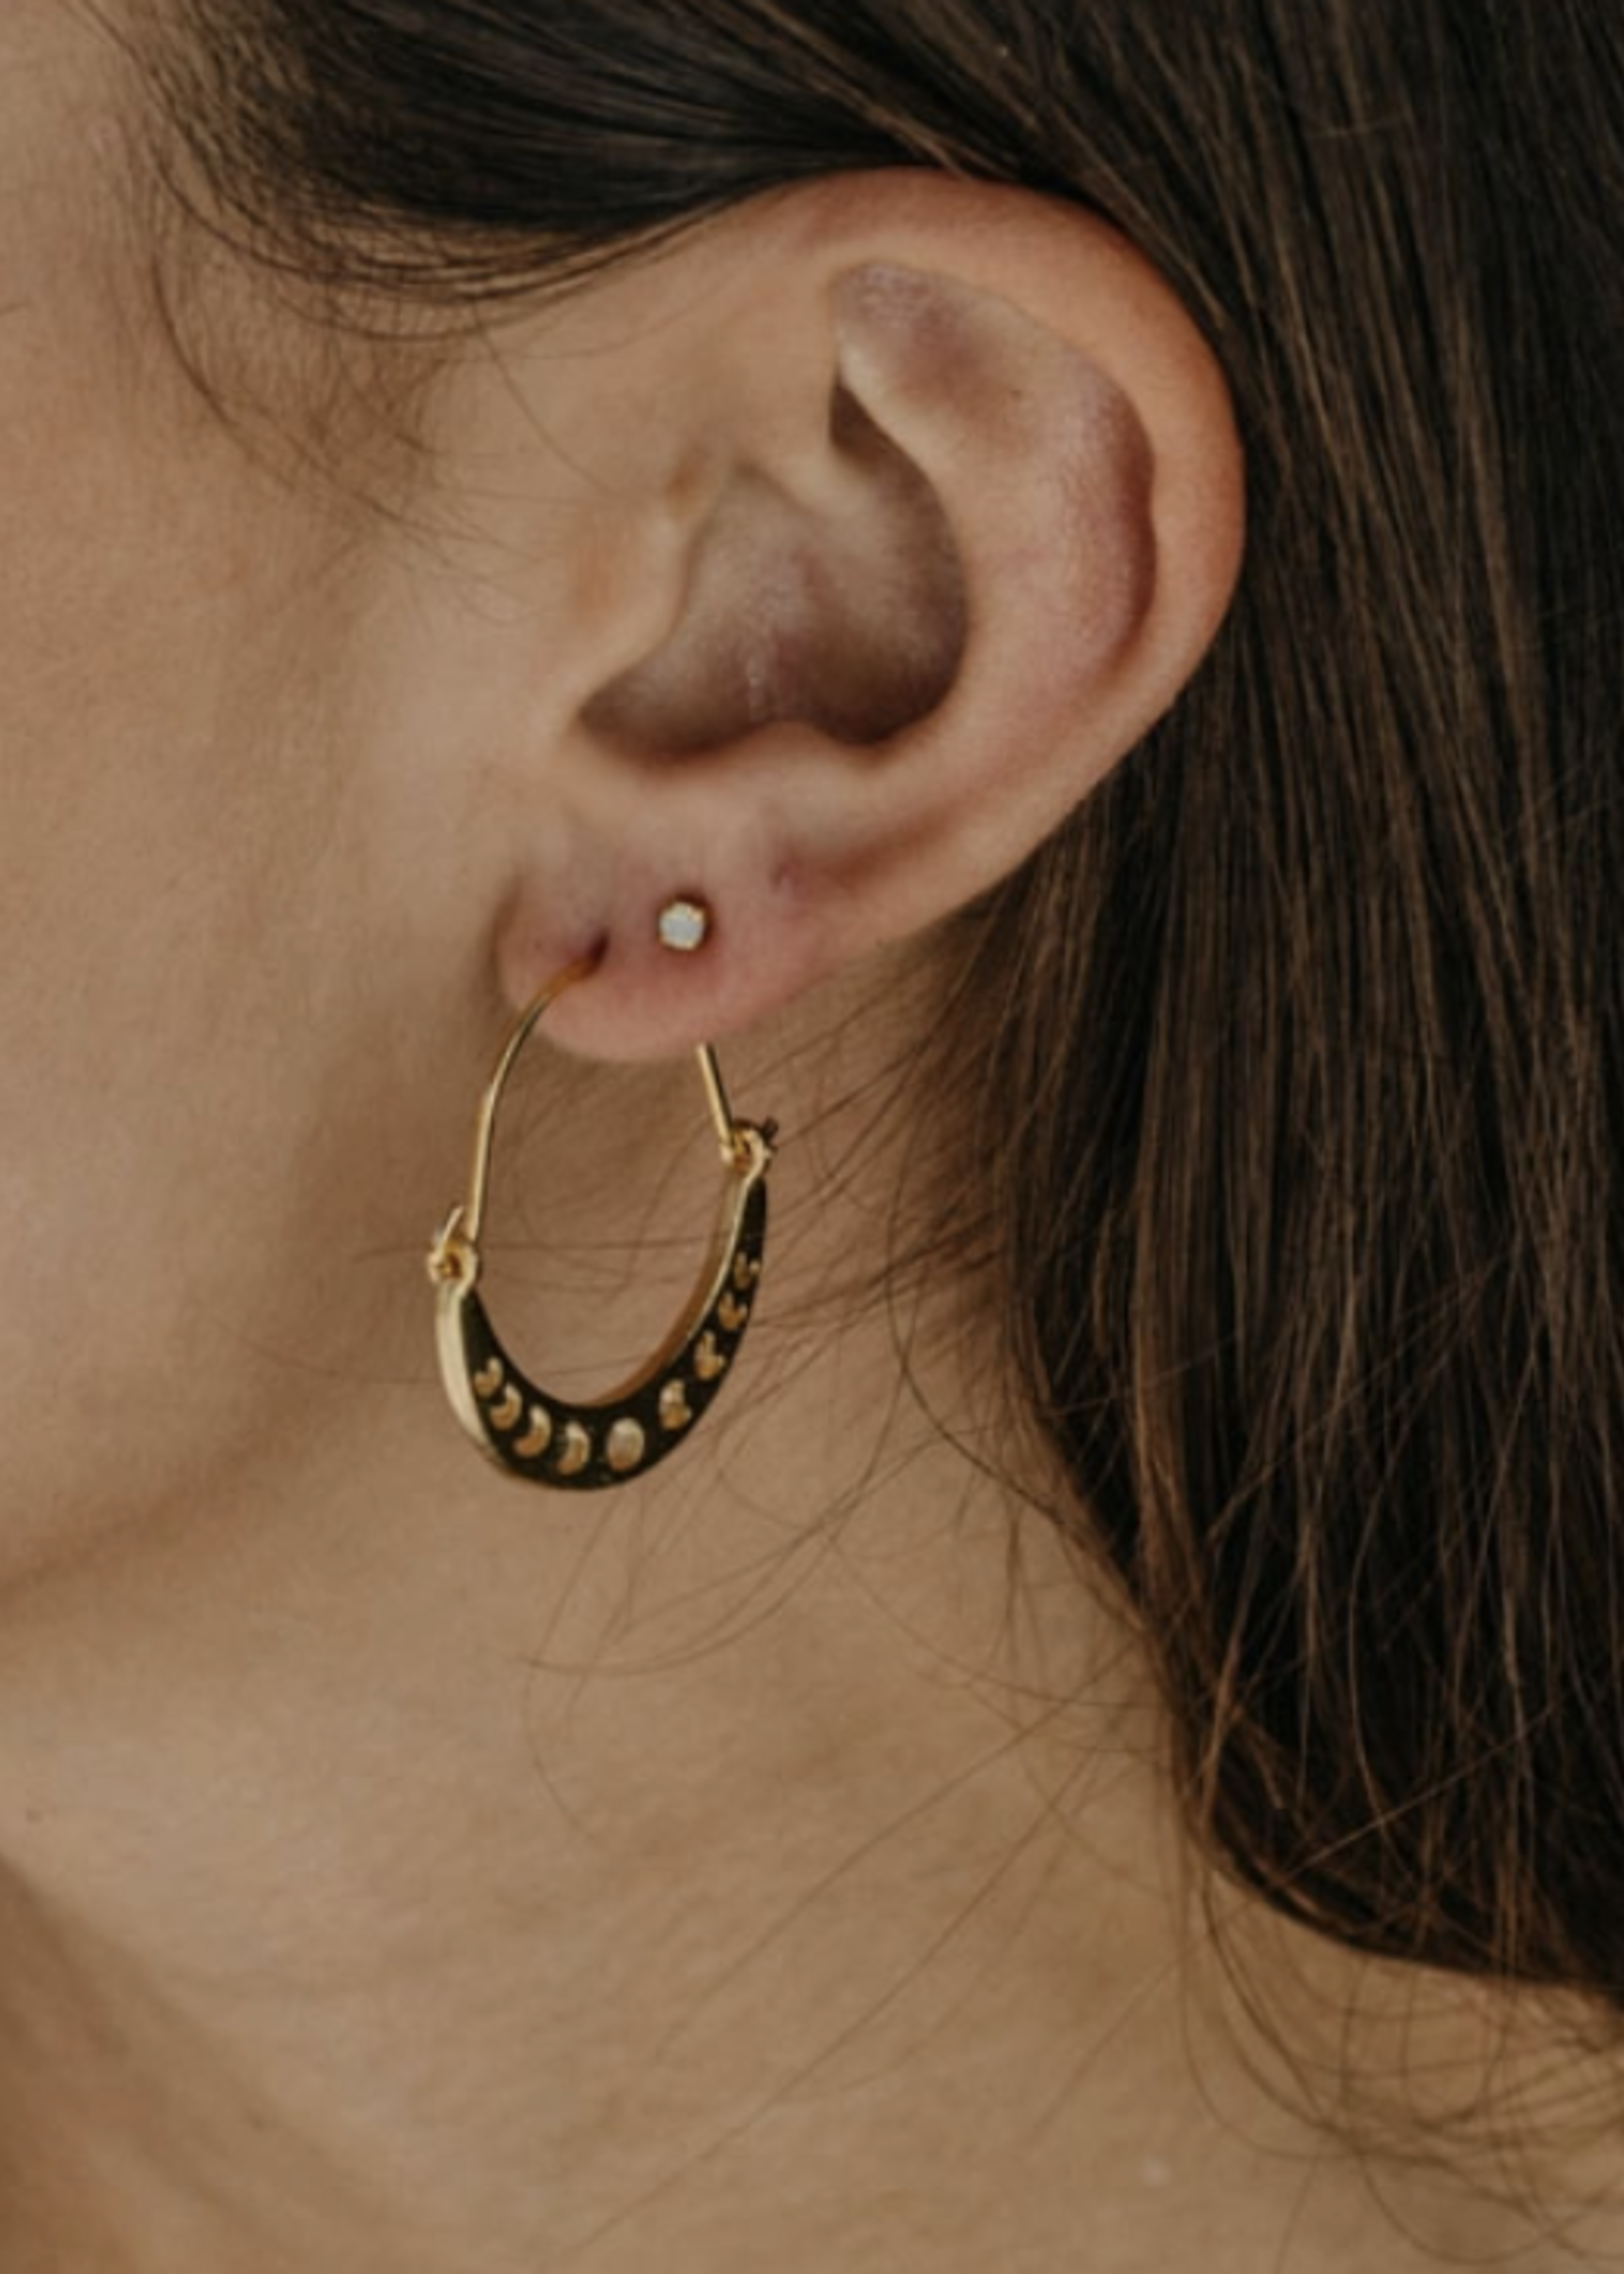 Amano Studio Phases of the Moon Earrings